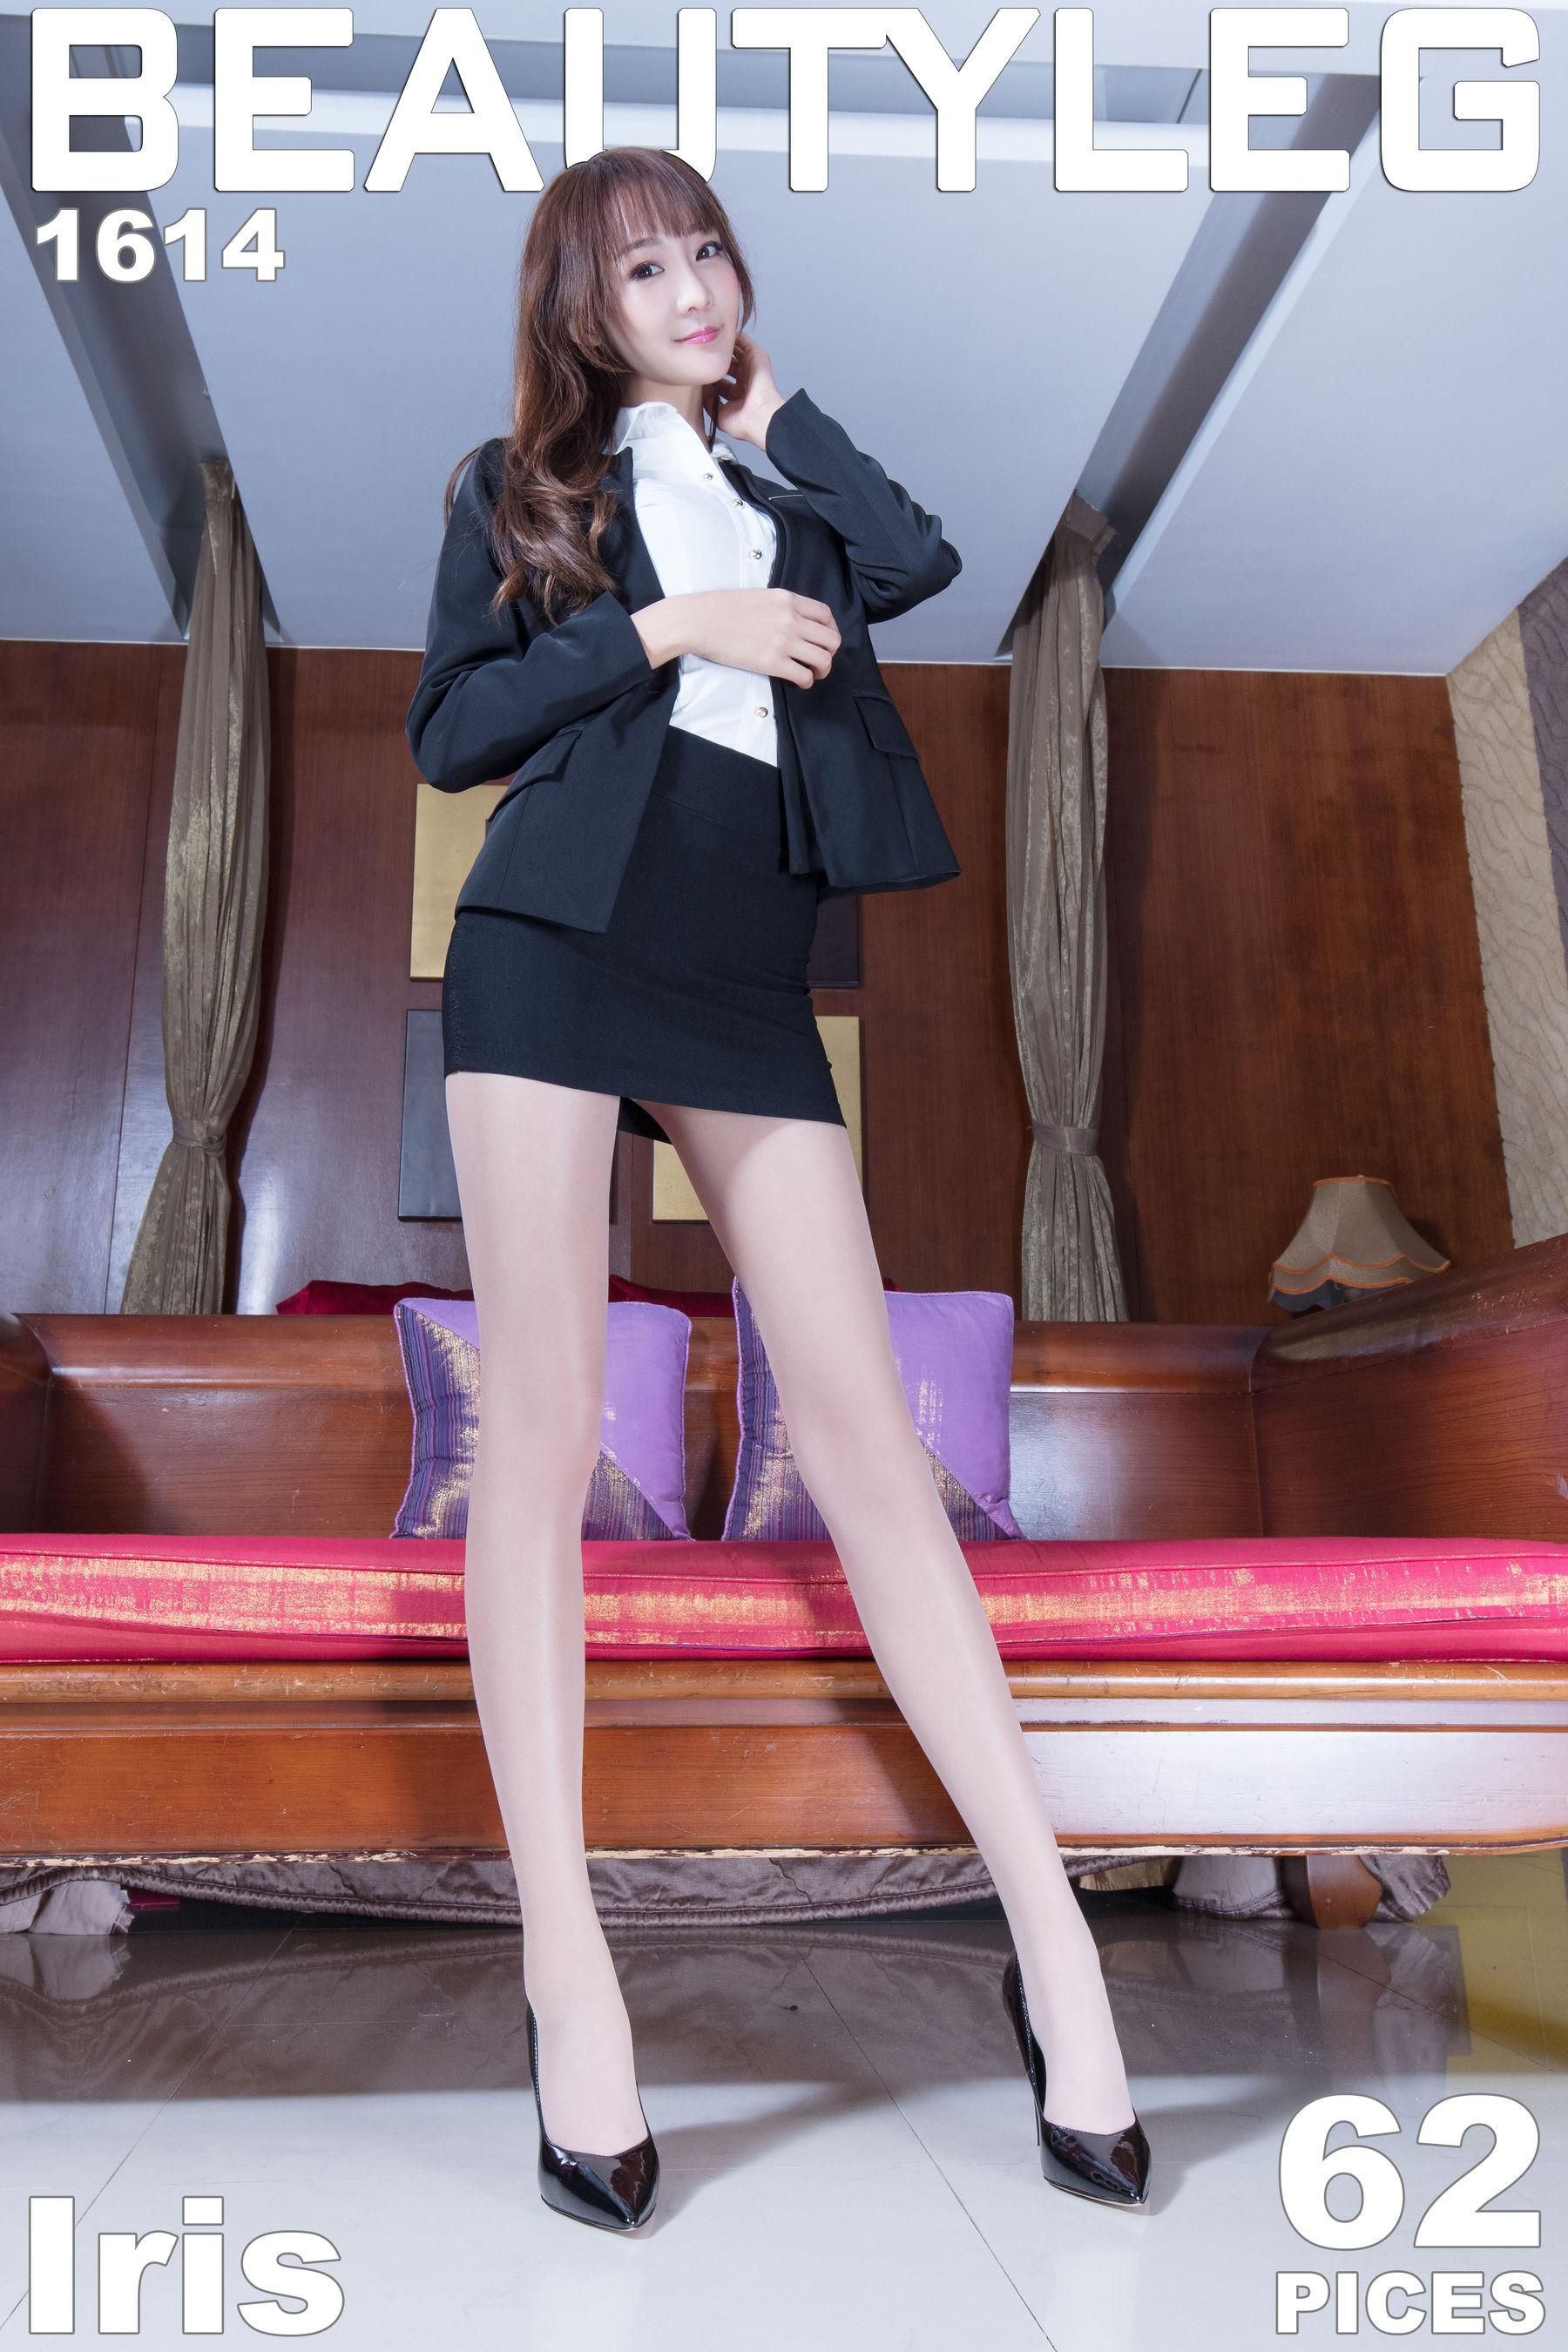 VOL.767 [Beautyleg]丝袜美腿高跟美腿长腿美女:刘萱(腿模Iris)超高清个人性感漂亮大图(62P)